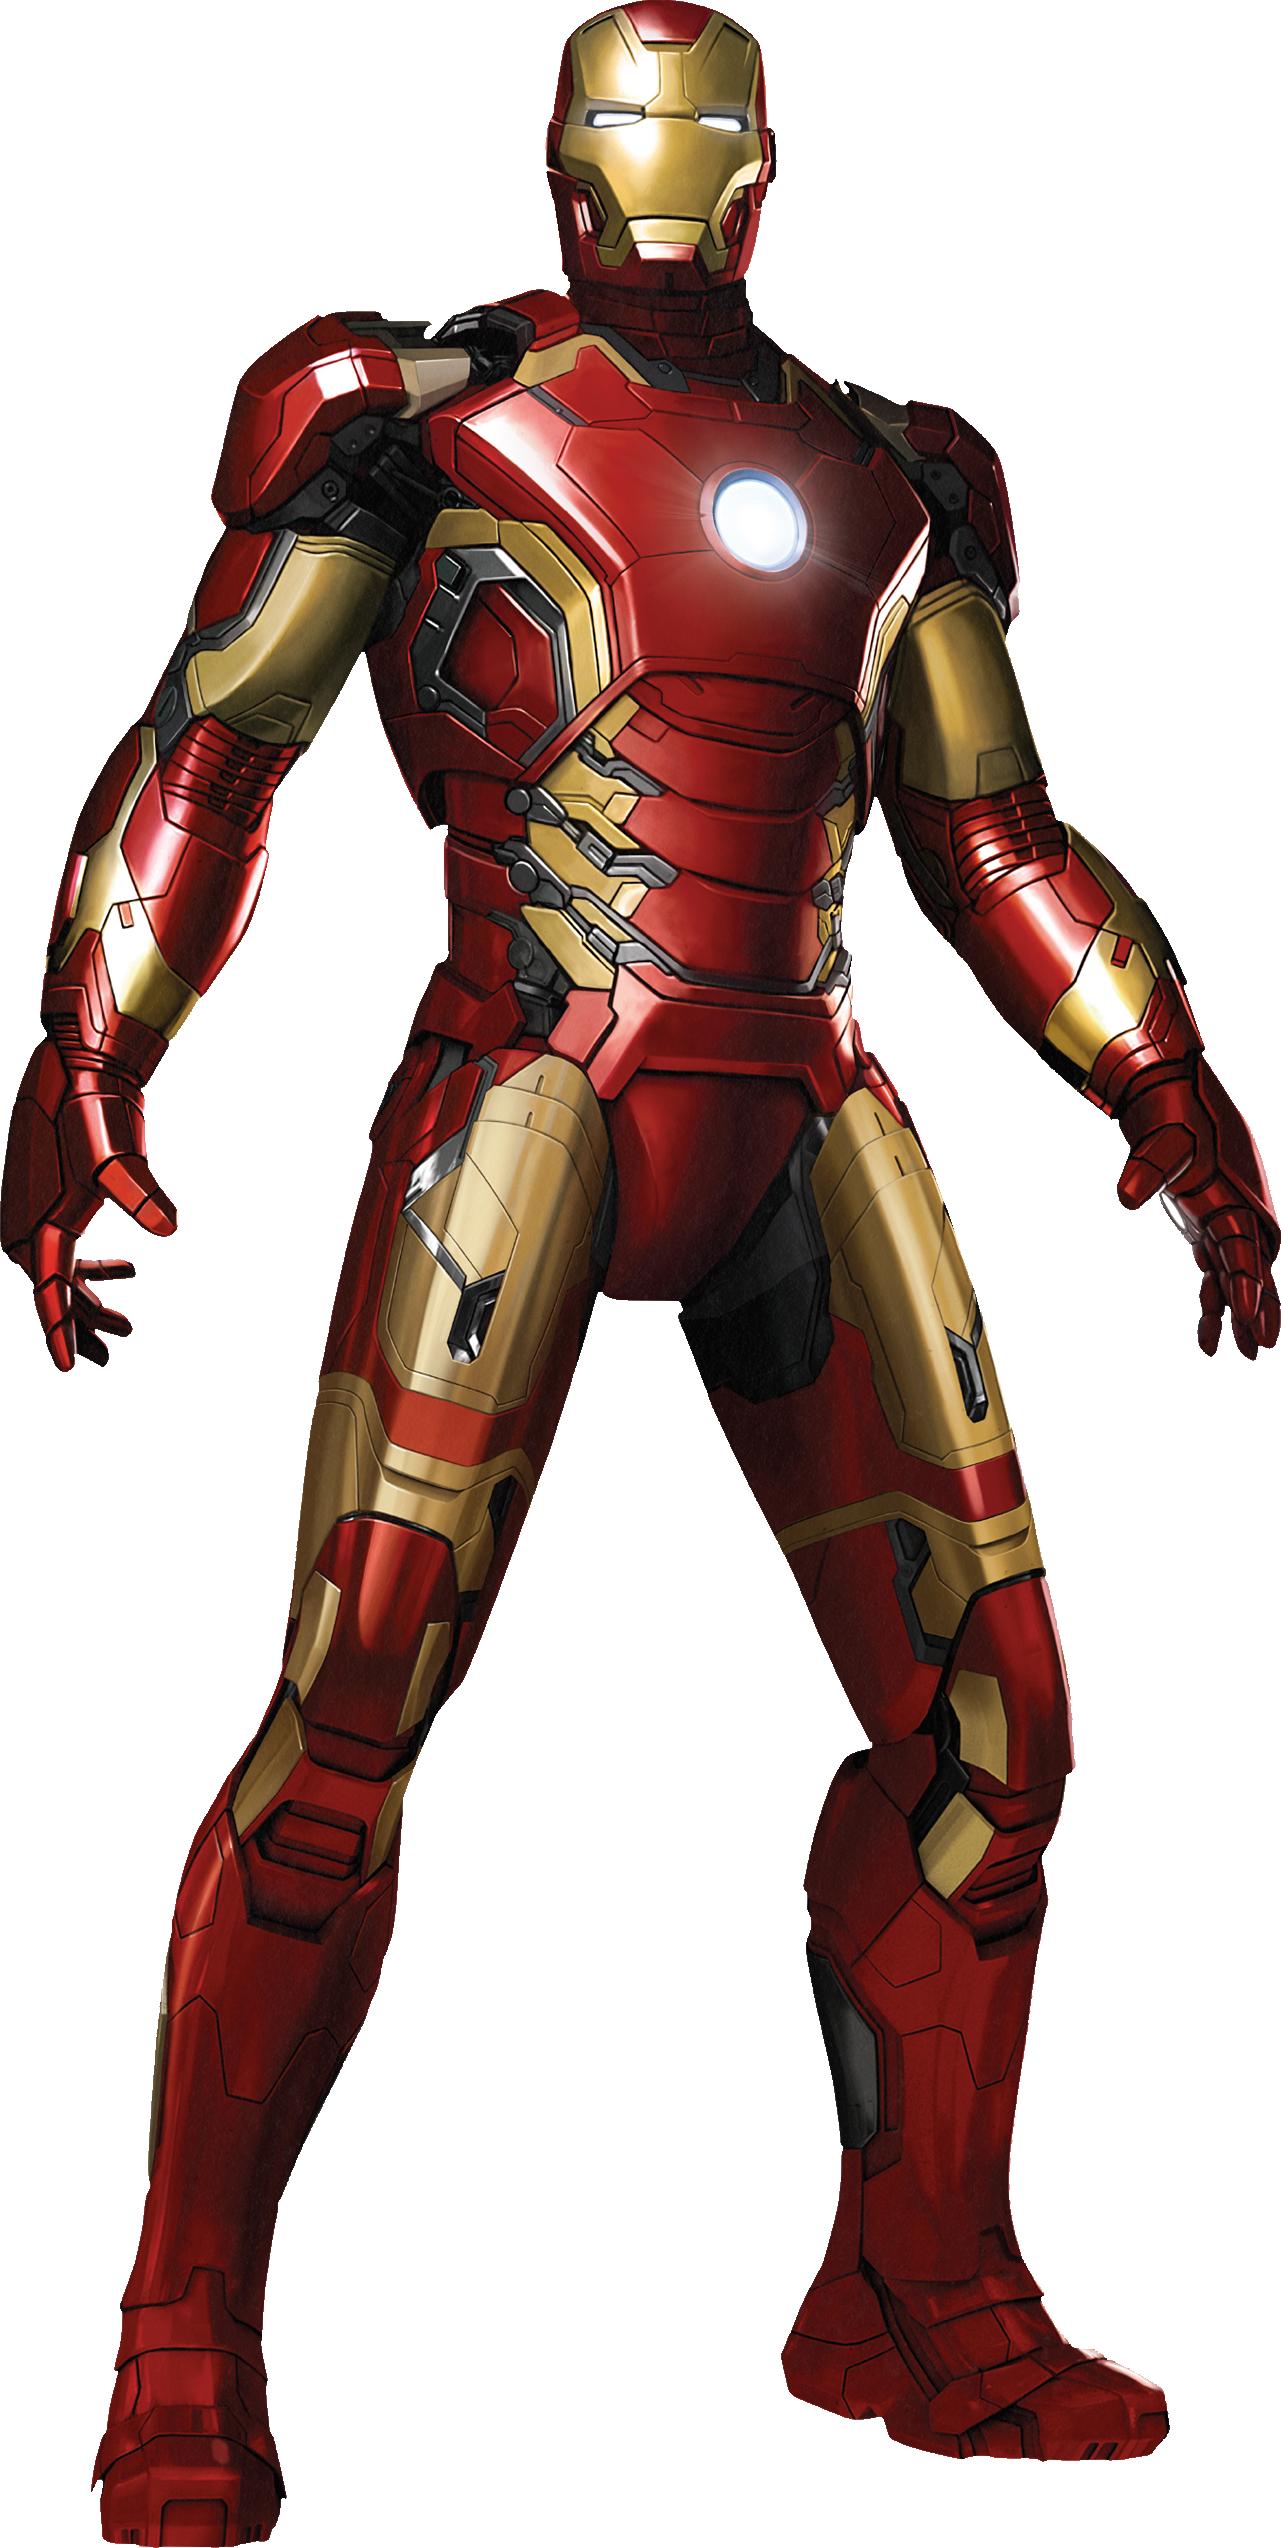 Master Chief  Prototype Suit Vs Iron Man